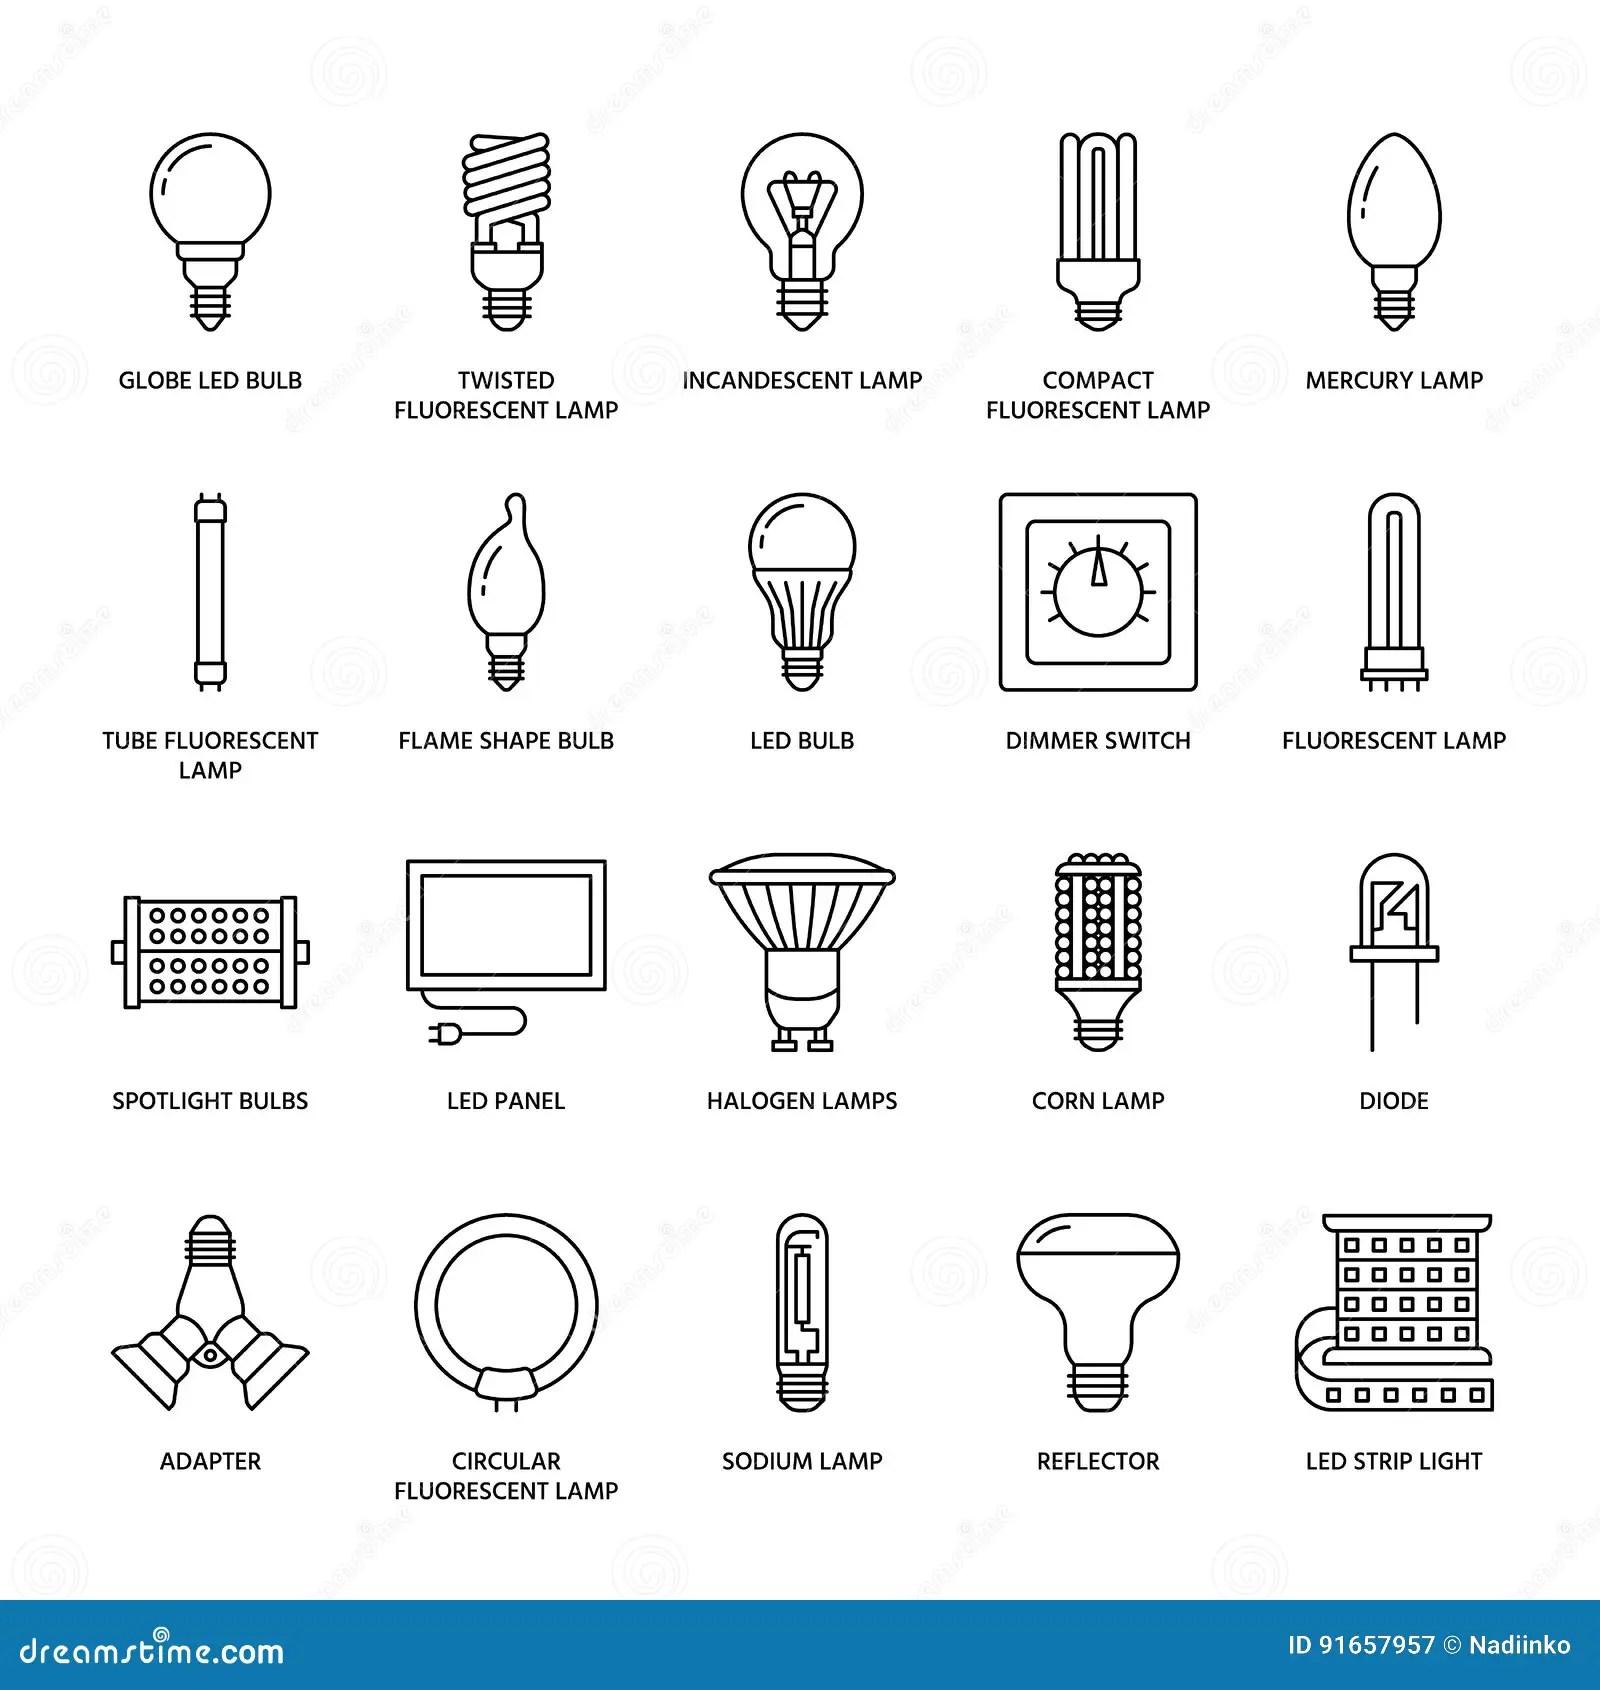 Ljusa Kulor Sanker Linjen Symboler Ledd Lamptyper